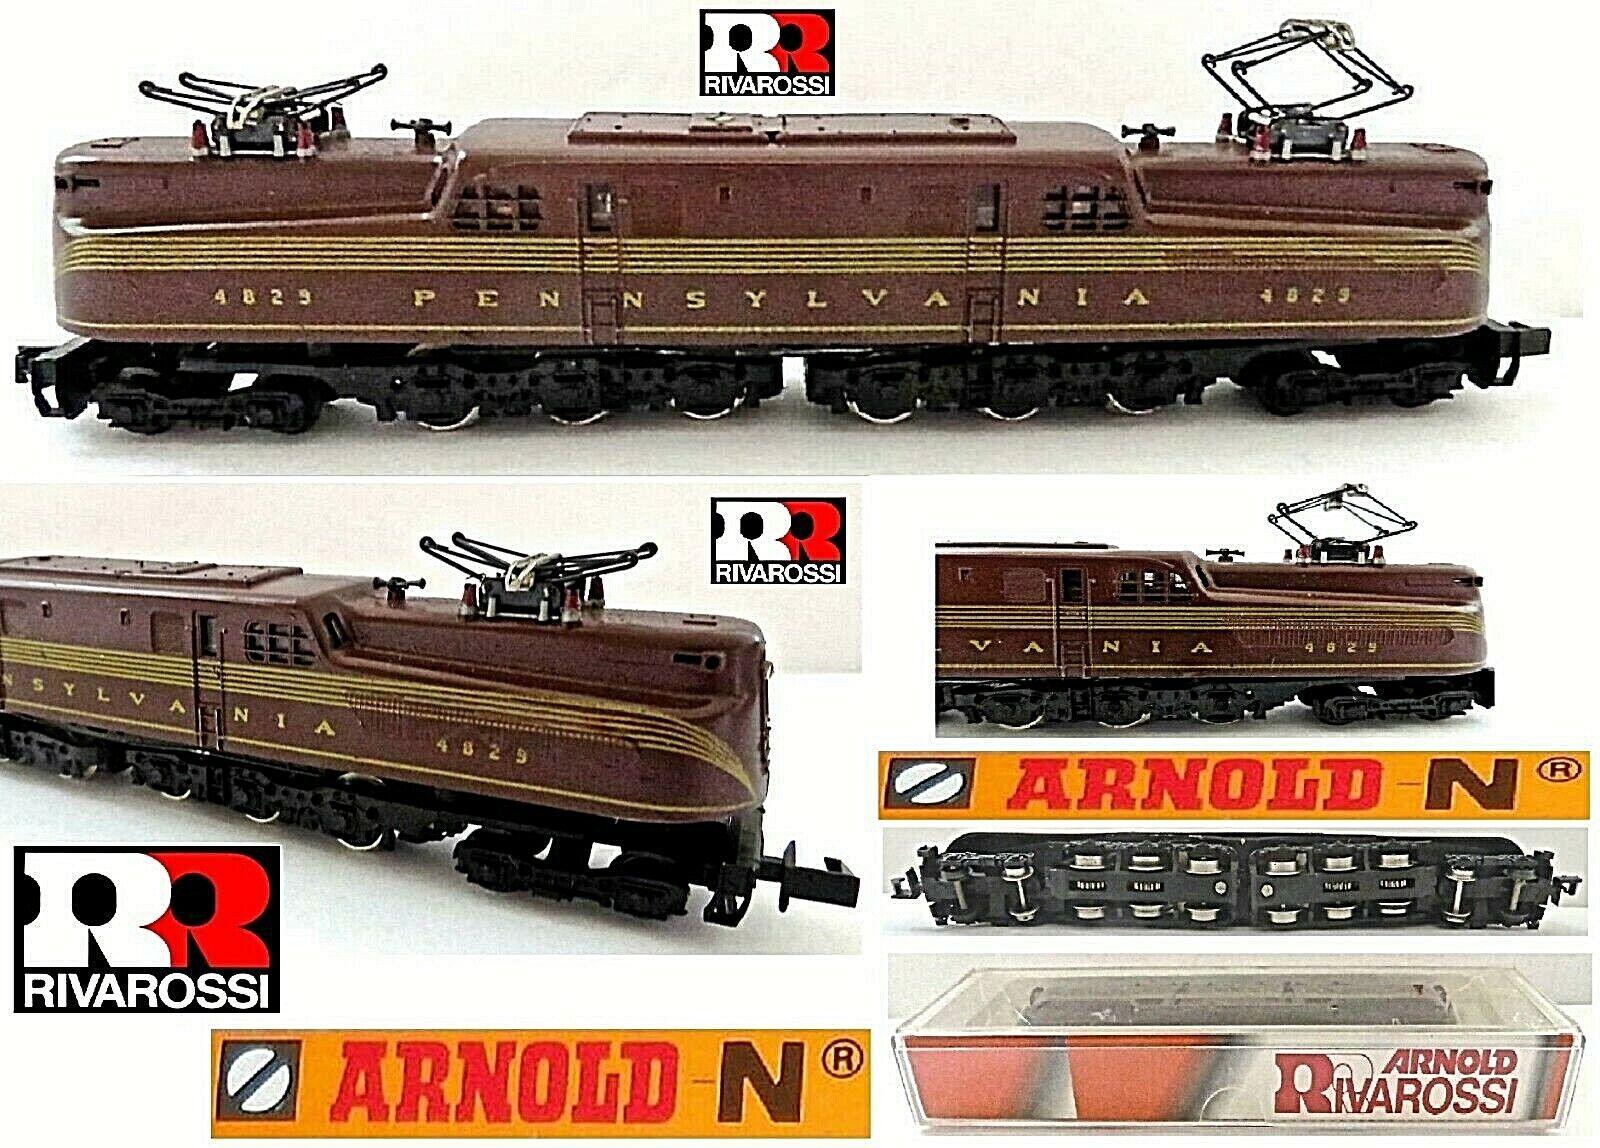 Arnold Rivarossi 5131 Vintage Locomotora GG1 Tuscan-rojo Pennsylvania USA Escala